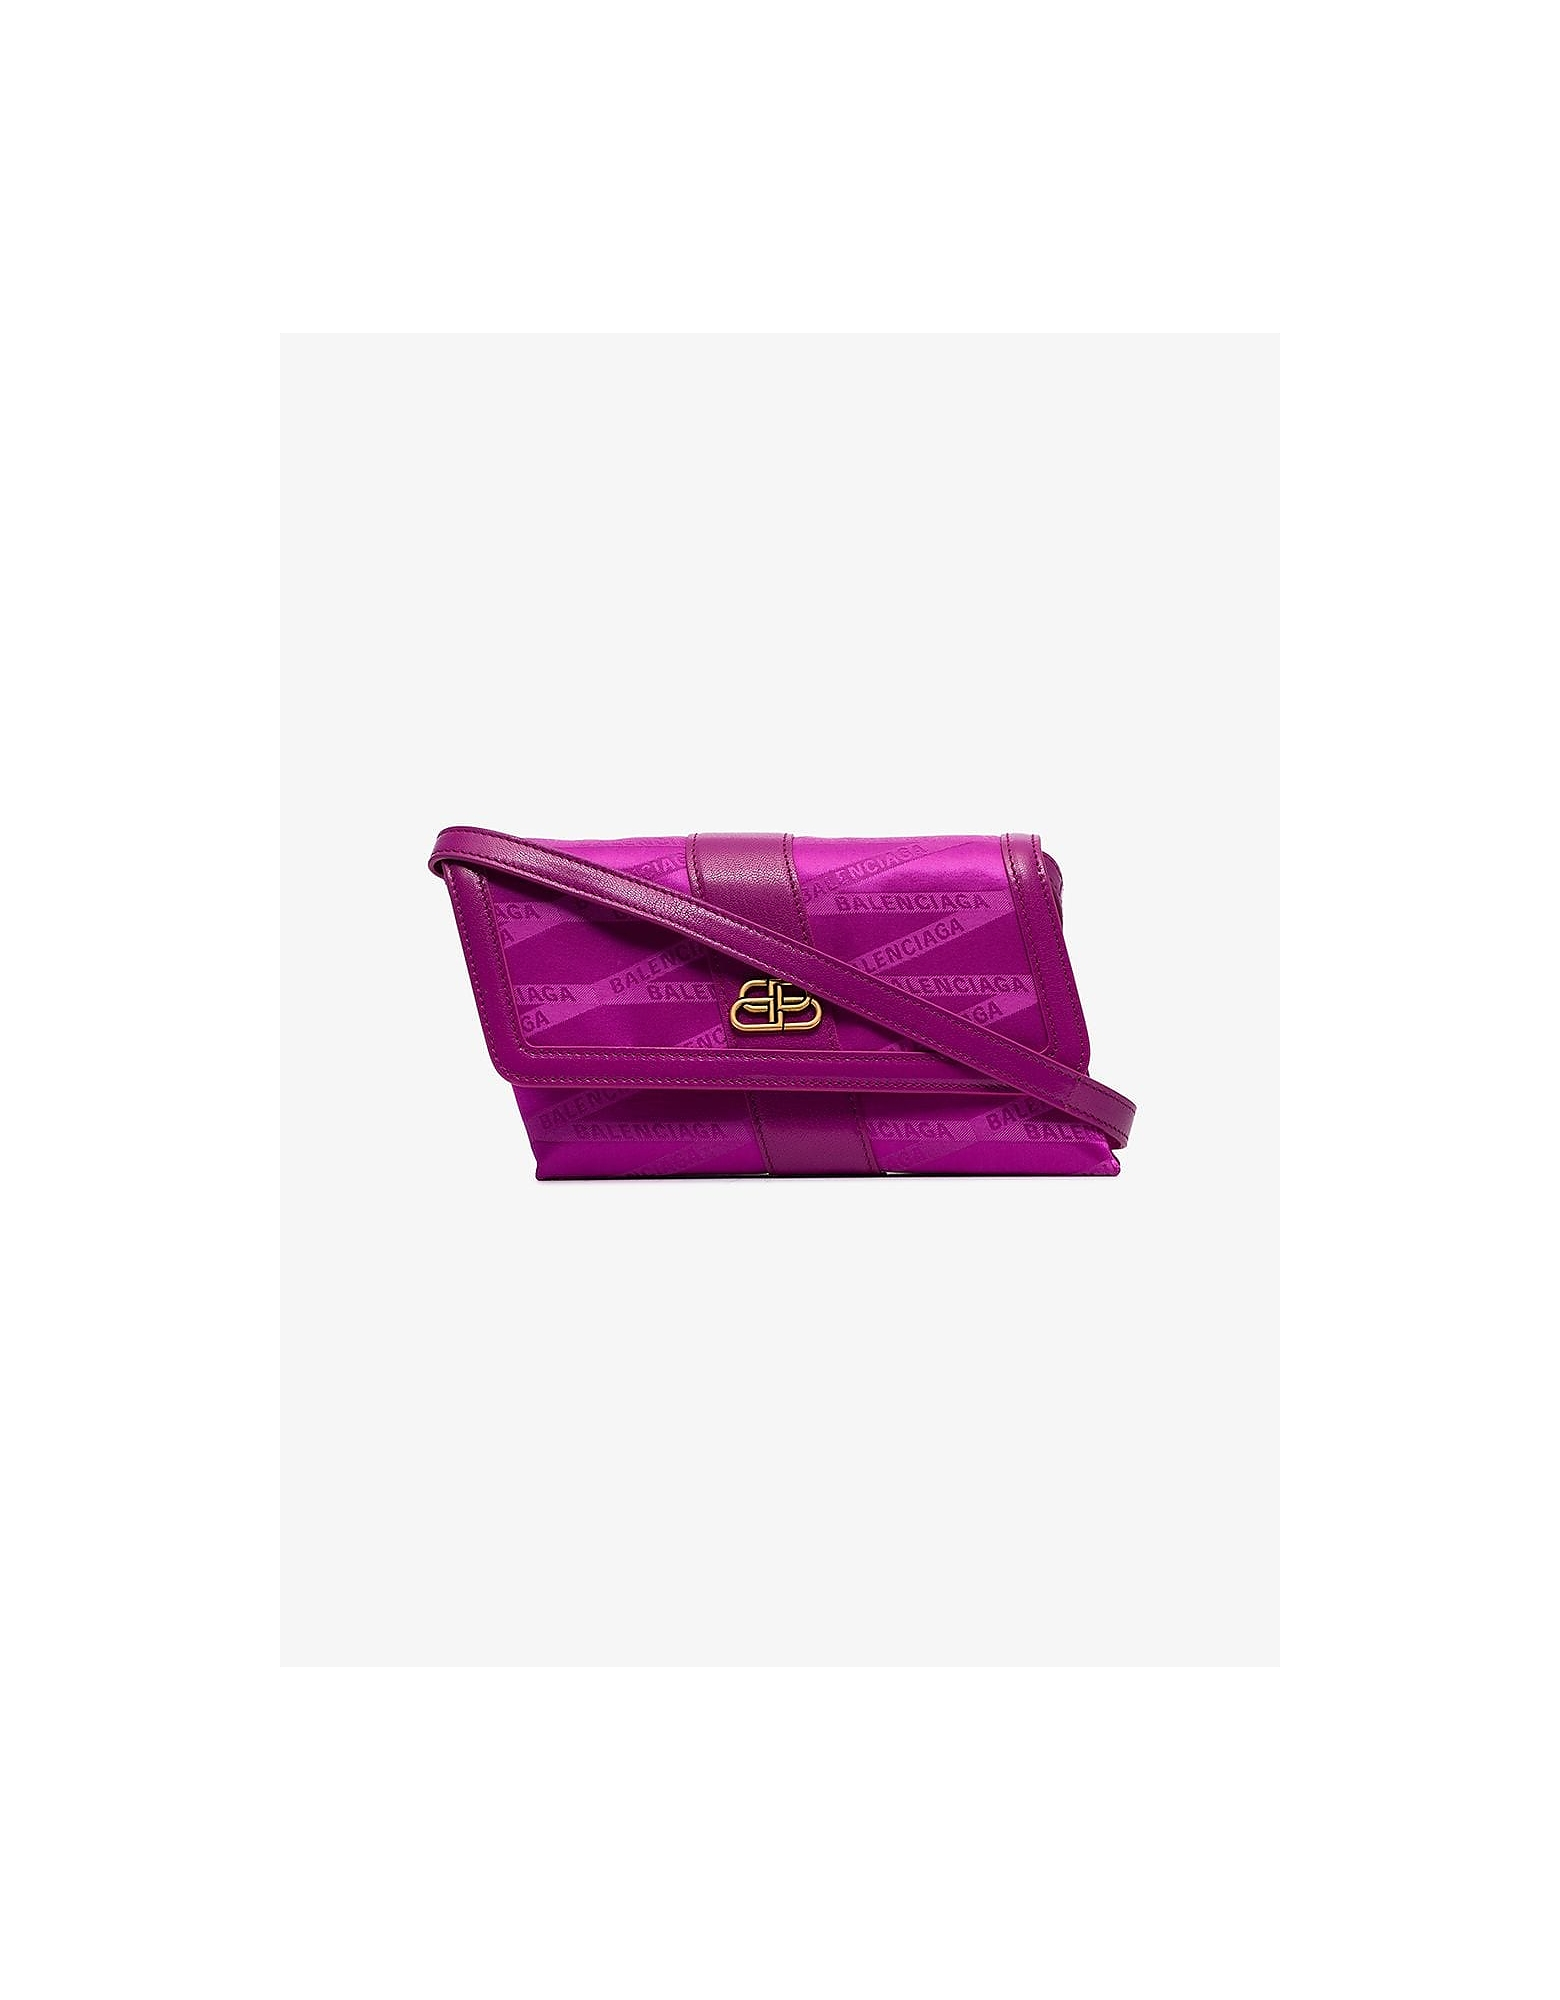 Balenciaga Crossbody FUCHSIA SHIFT MONOGRAM CROSS-BODY BAG